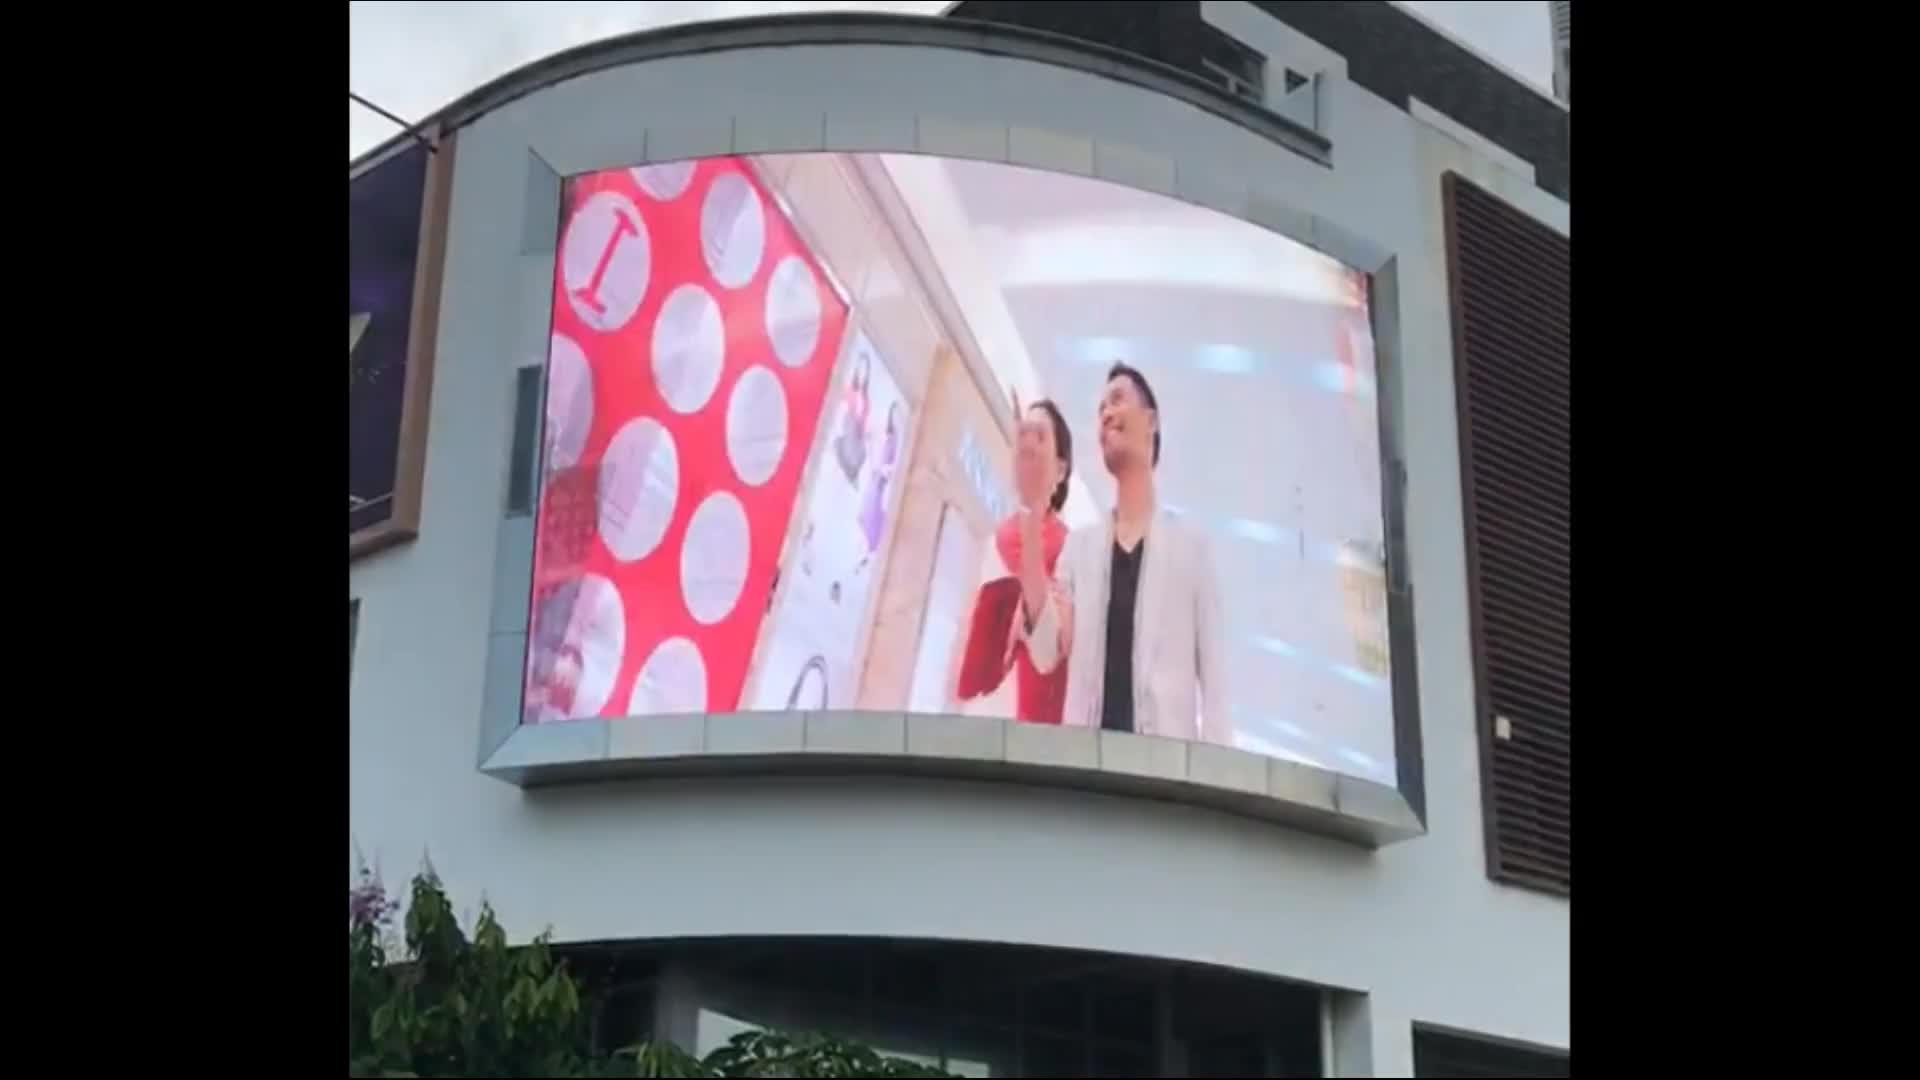 Big Outdoor Waterproof Advertising Full Color LED Display Screen